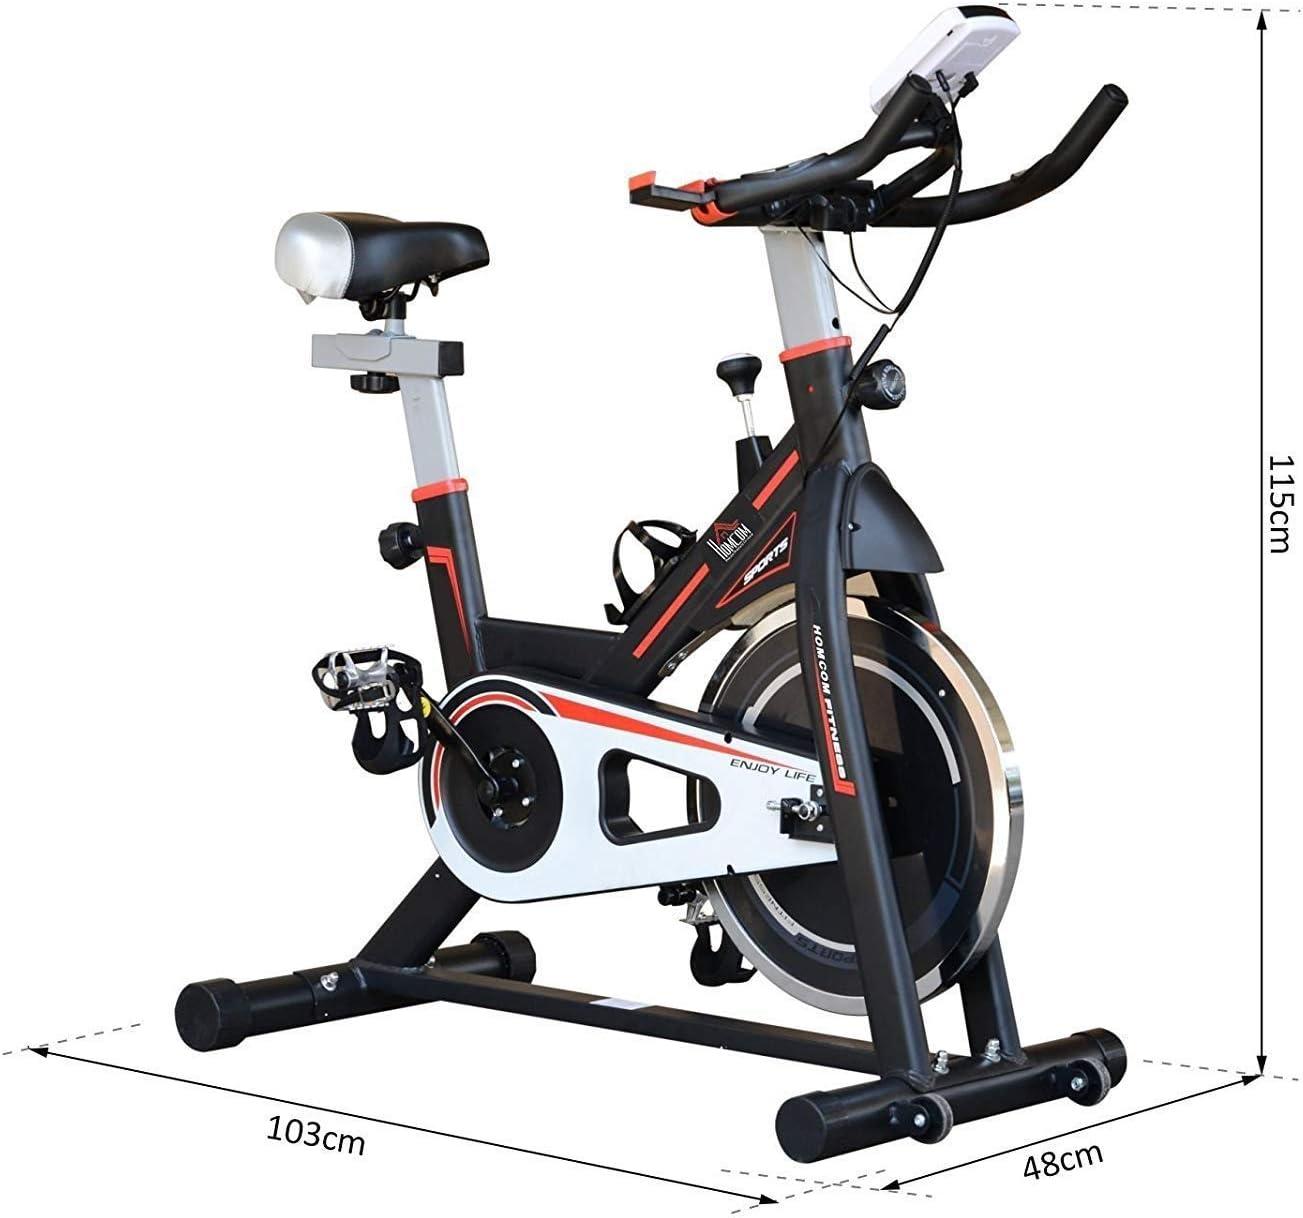 DFMD Bicicleta de Ejercicio Profesional para Interiores, Volante Fresco, cinturón Ultra silencioso, hogar, pérdida de Peso Abdominal, Bicicleta para Ejercicios, Pantalla LED, Soporte para Tableta: Amazon.es: Deportes y aire libre